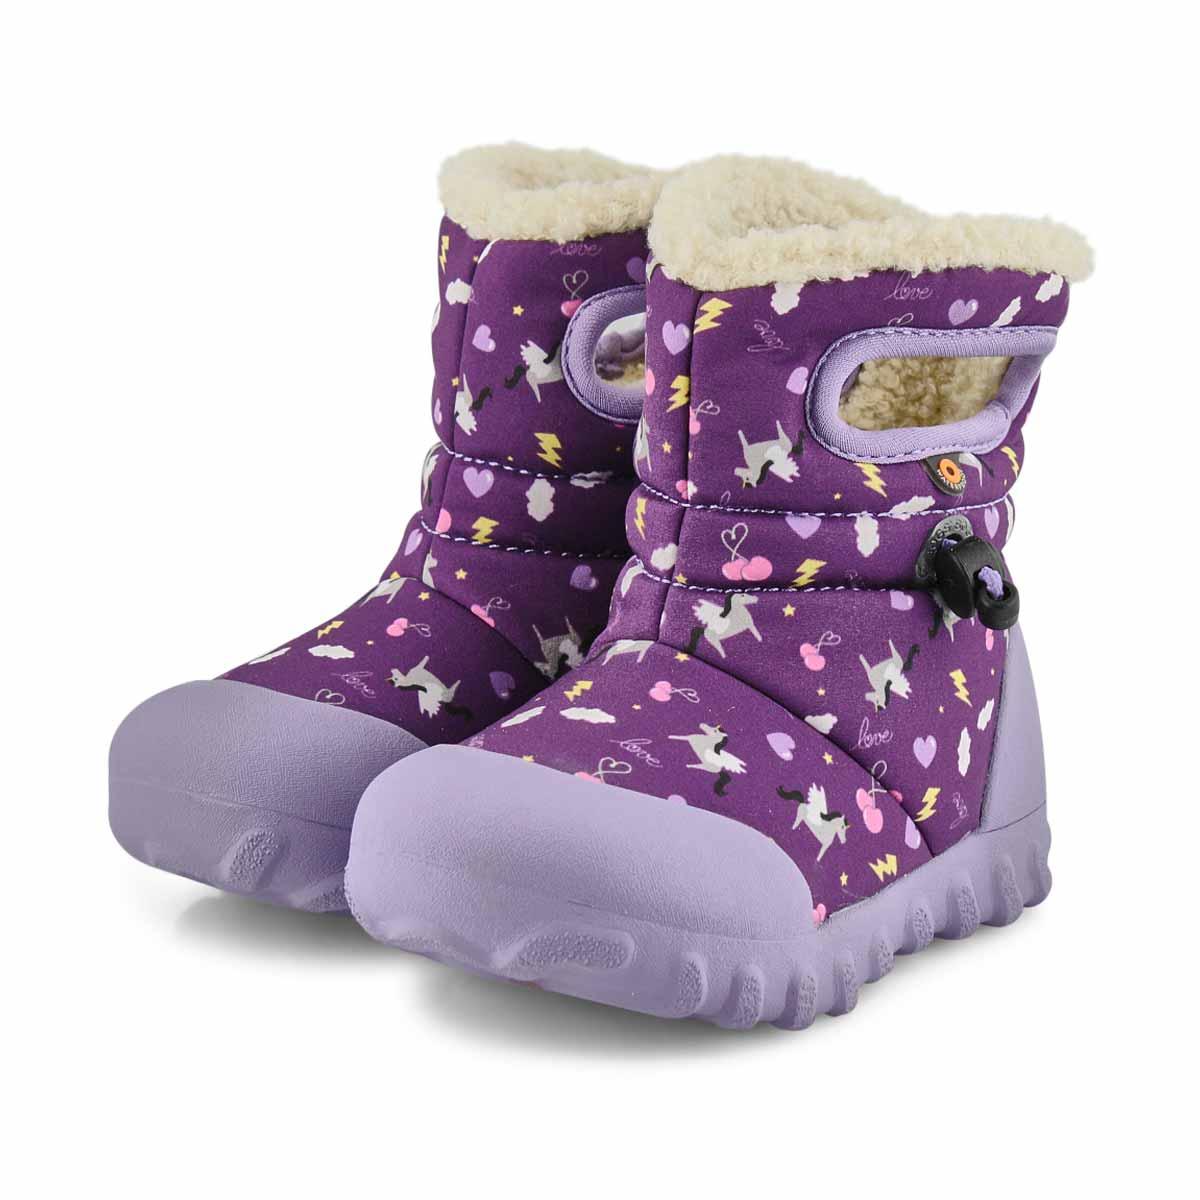 Infant's B-Moc Pegasus Waterproof Boot - Ppl Mlt